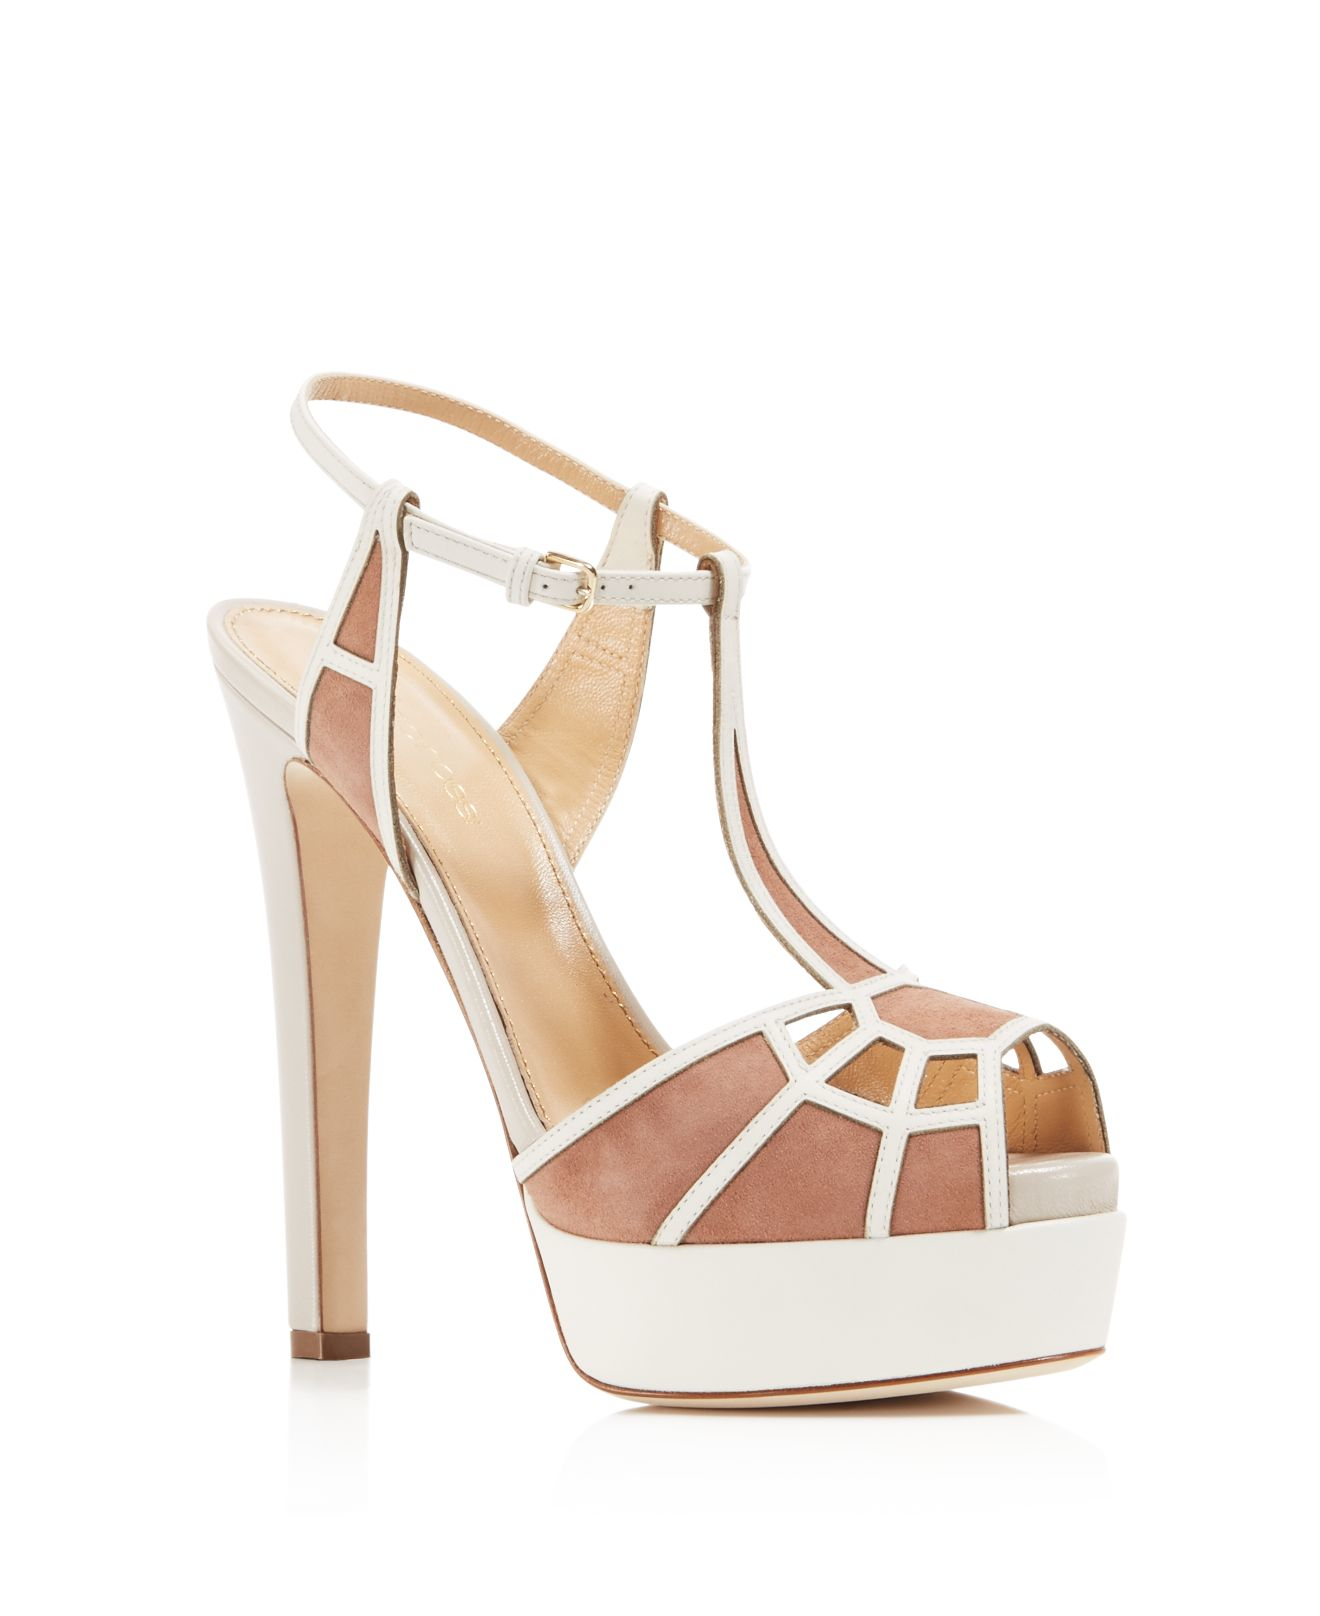 Innovative  Women Gt Women39s Flats Gt Adorable GtBlack Patentcomfort Shoes